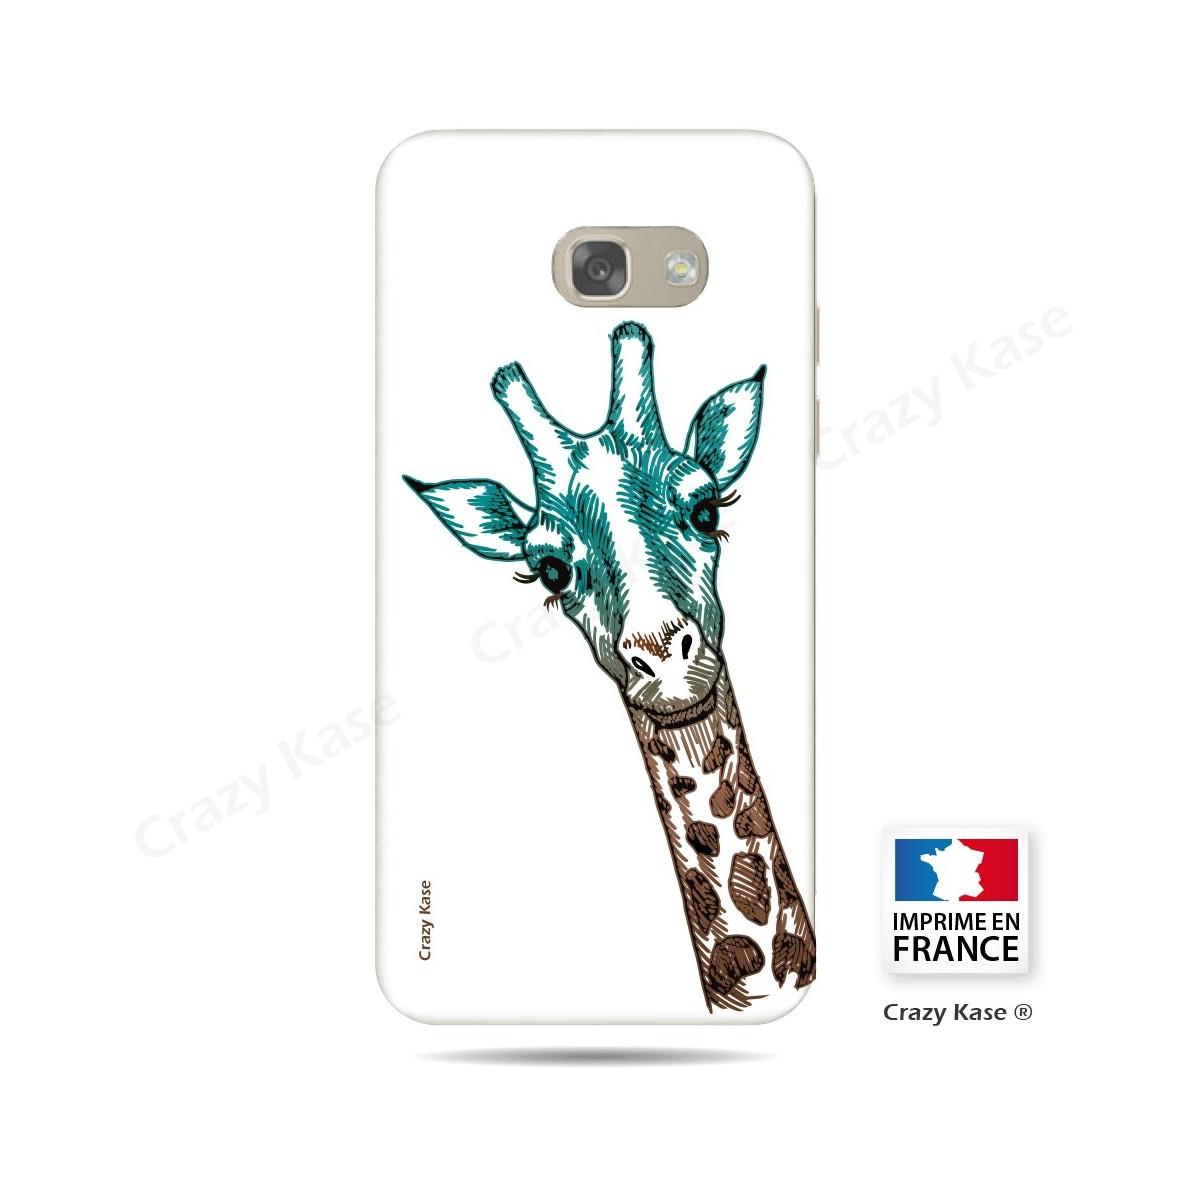 Coque Galaxy A3 (2017) souple motif Tête de Girafe sur fond blanc - Crazy Kase